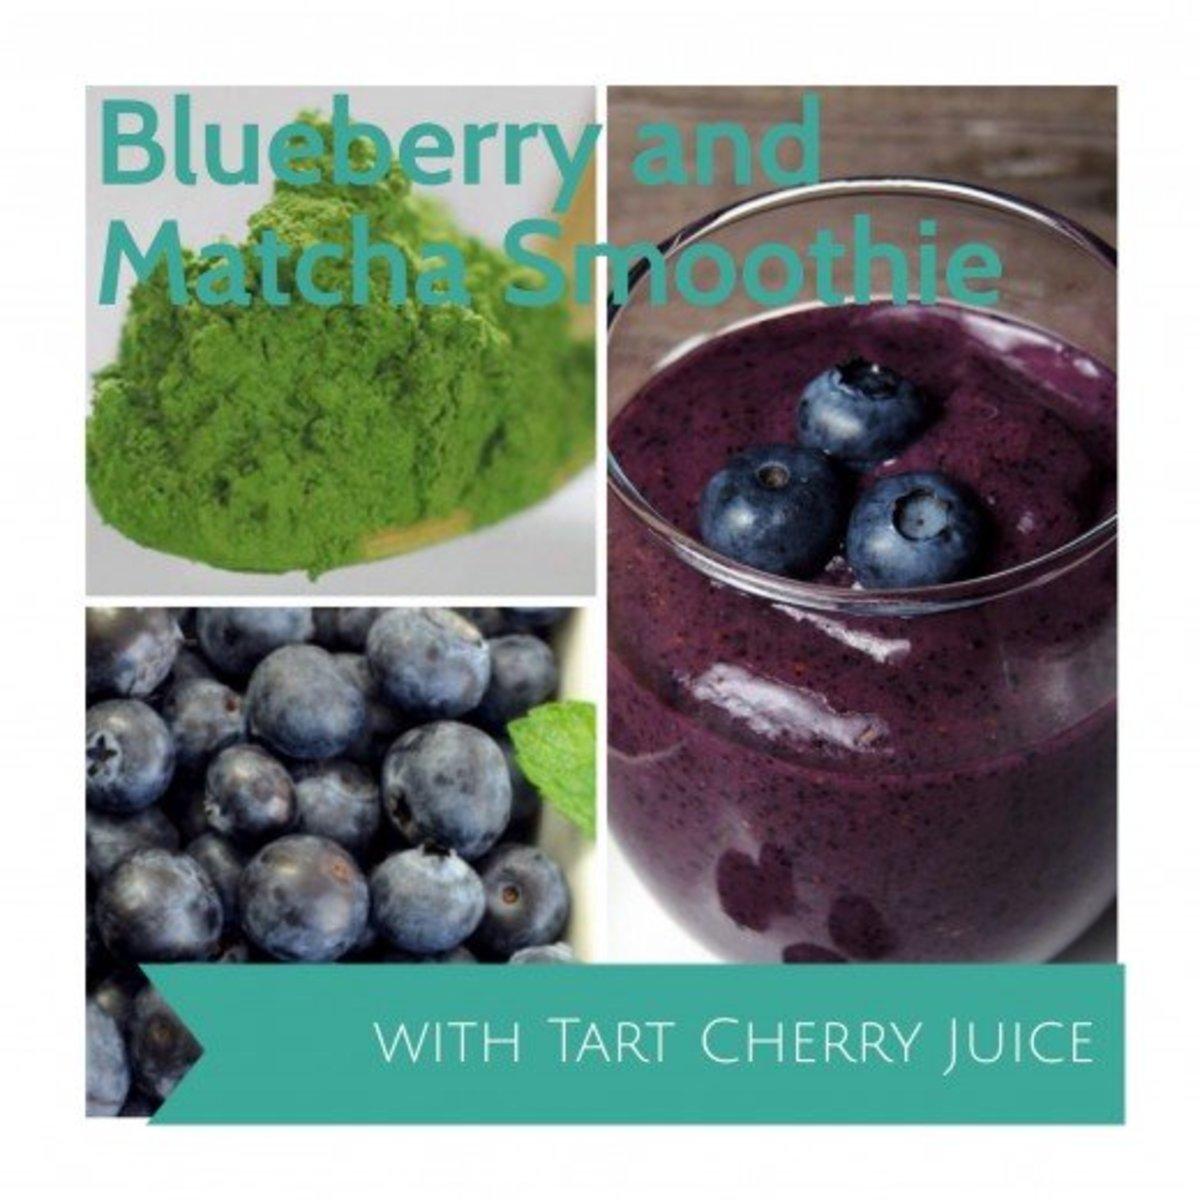 Blueberry, matcha and tart cherry juice smoothie!